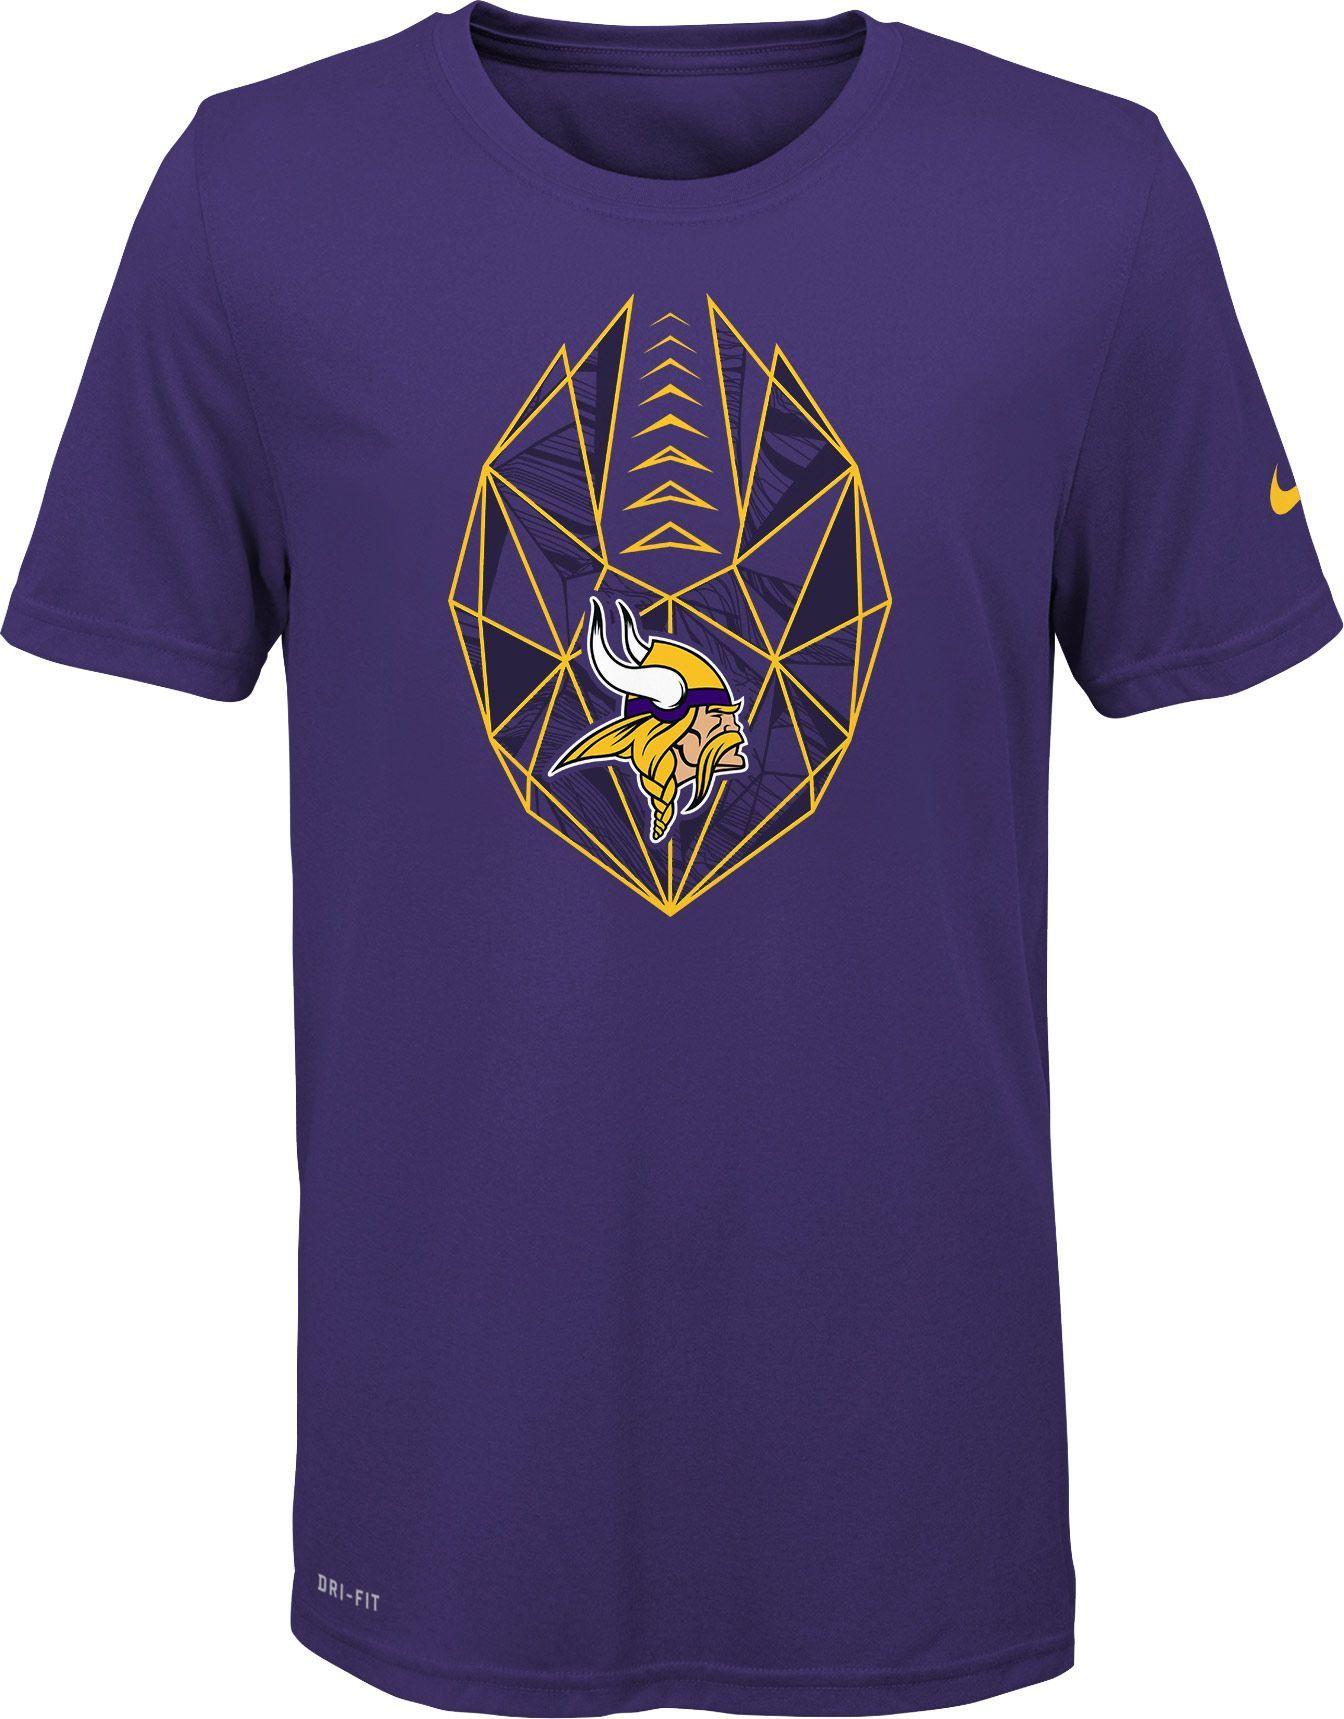 fba3b5194 Nike Youth Minnesota Icon Performance Purple T-Shirt